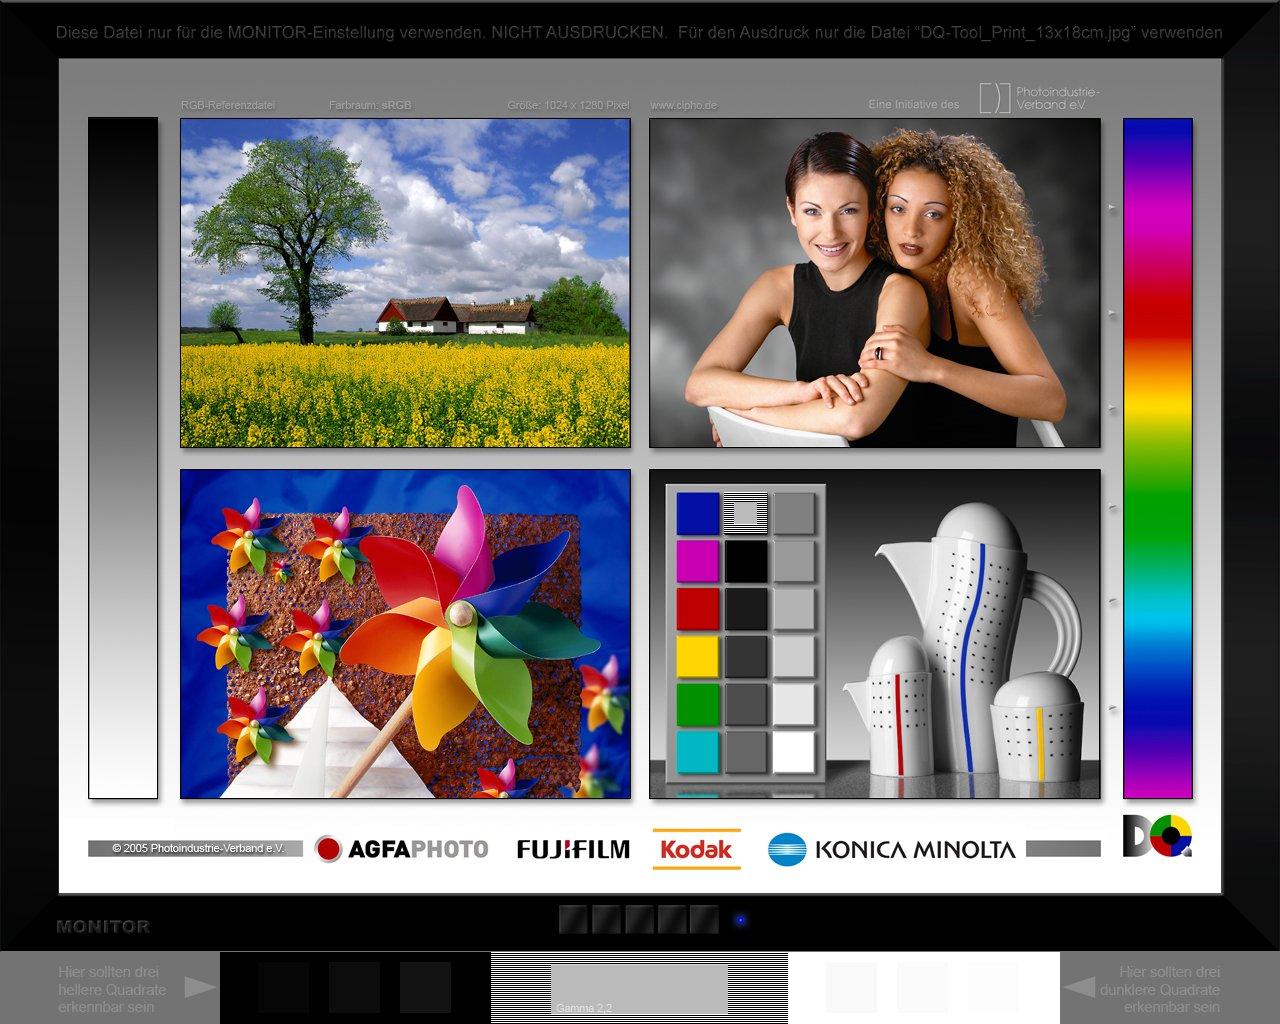 289437799_DQ-Tool_Monitor2.jpg.b9b283be2288a03c01d09ad9cc1b1a86.jpg